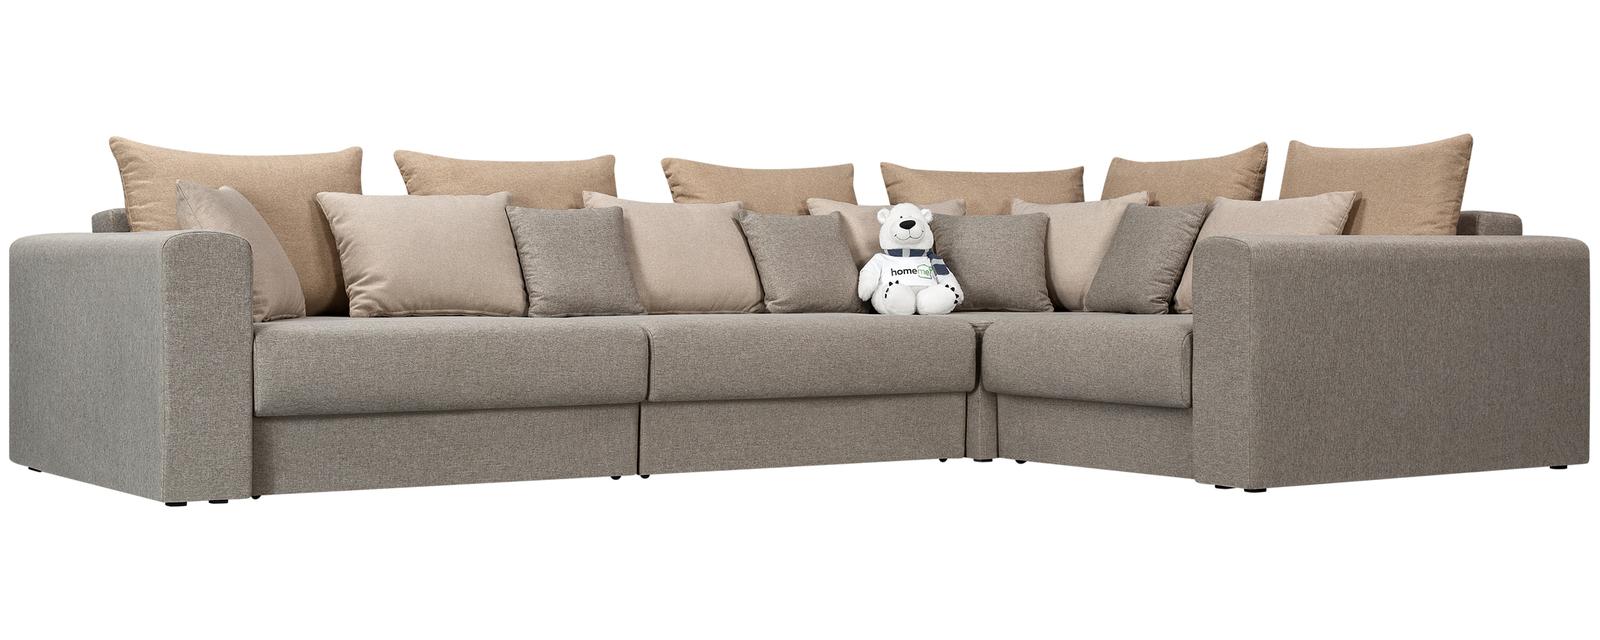 Модульный диван Медисон Вариант №2 Kiton серый (Рогожка)